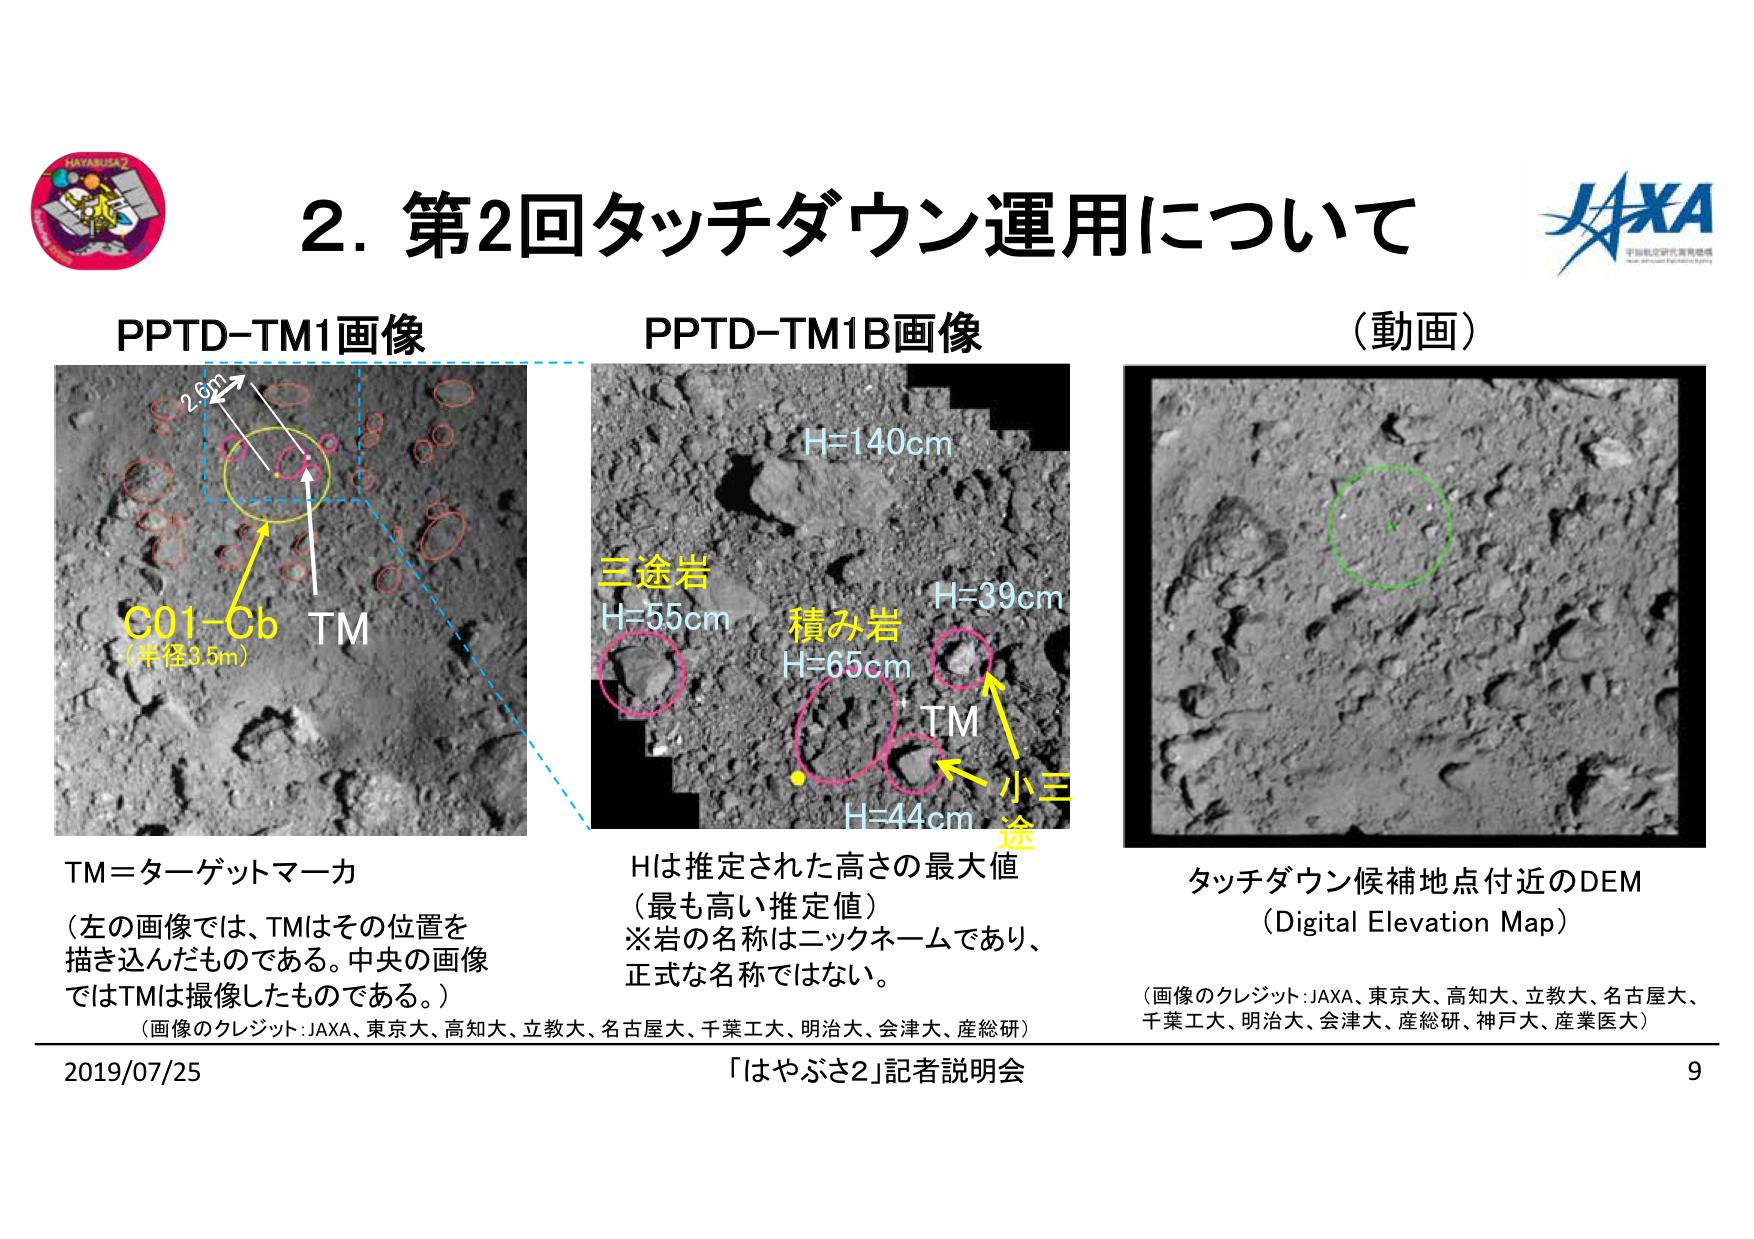 f:id:Imamura:20190725151125p:plain